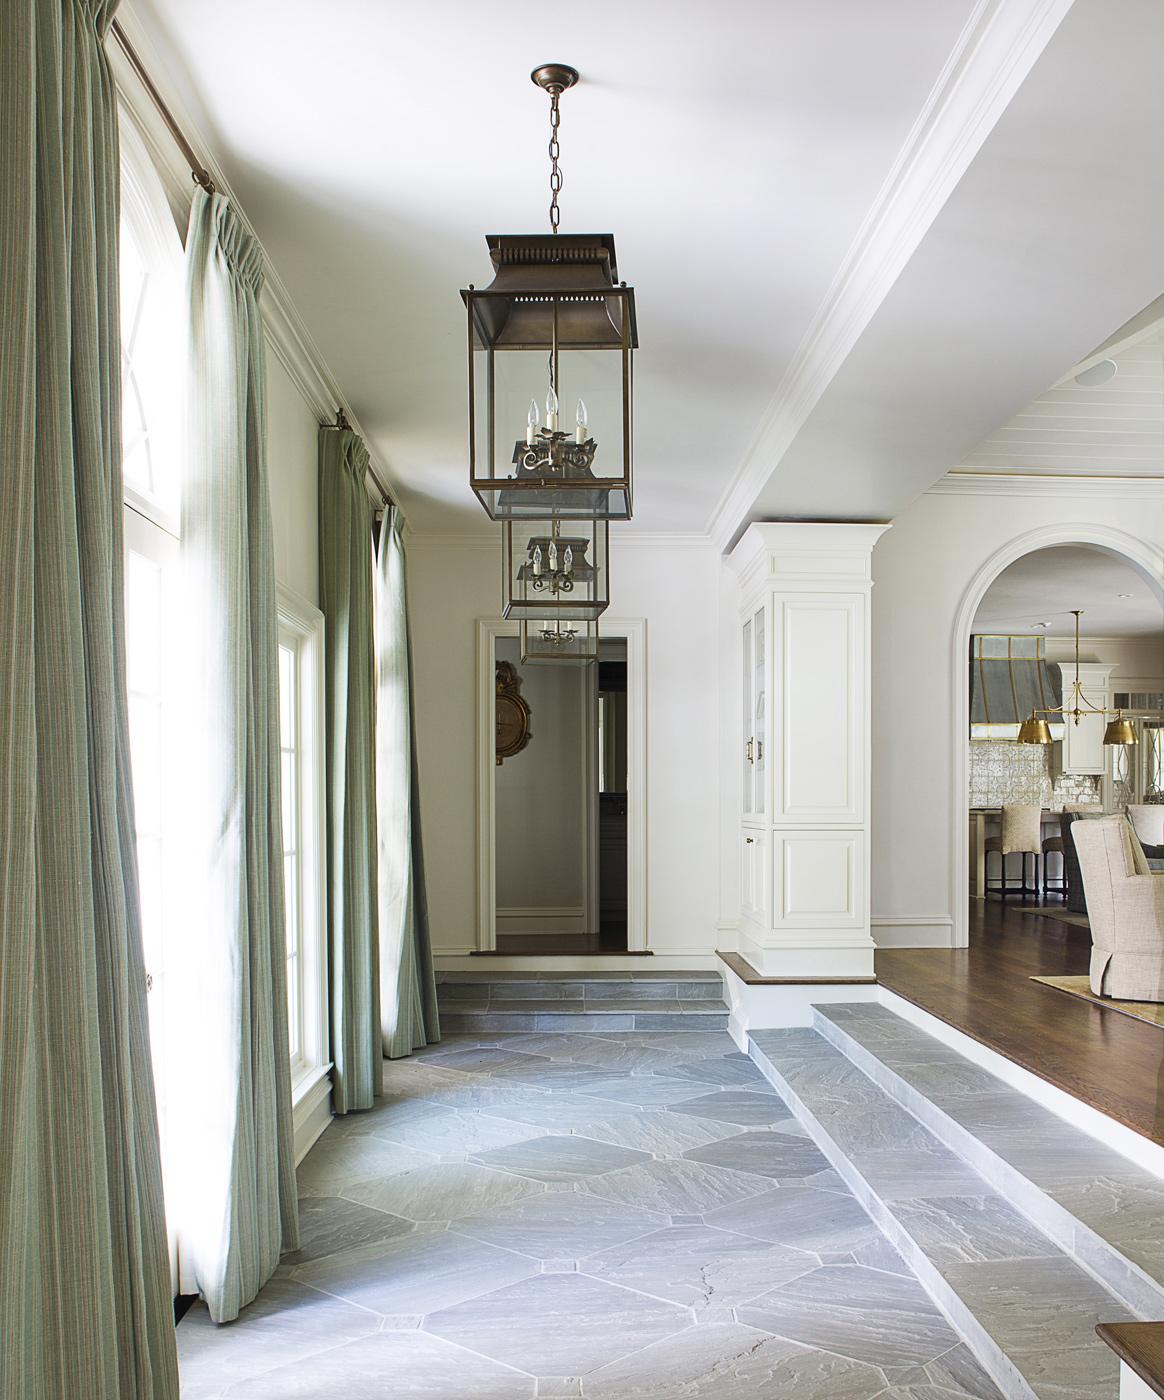 Cindy-McCord-Interior-Design-Collierville-House-019.jpg